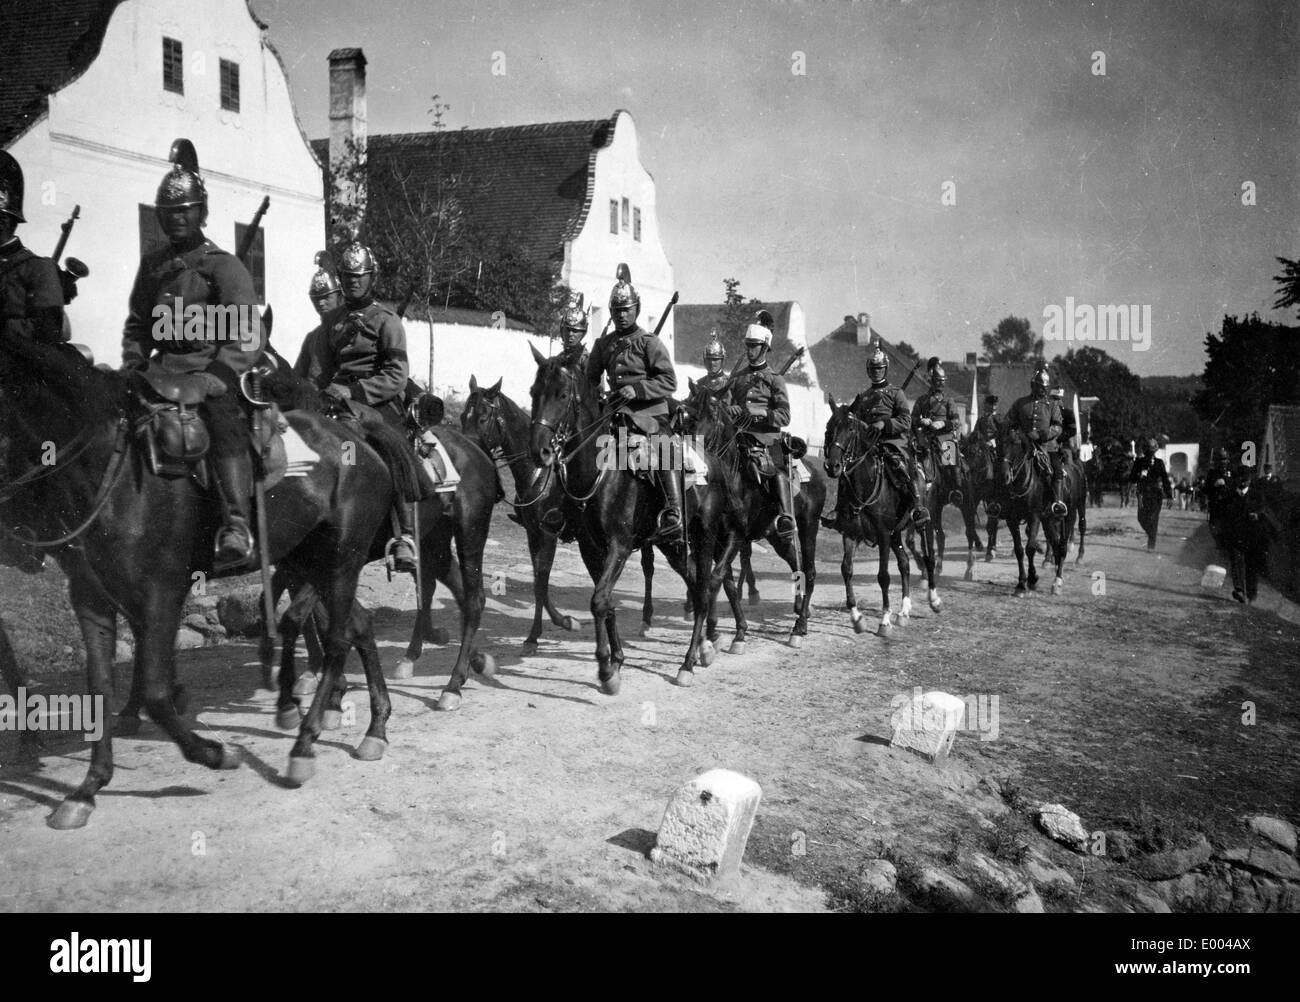 Austro-Hungarian dragoons, 1914 - Stock Image